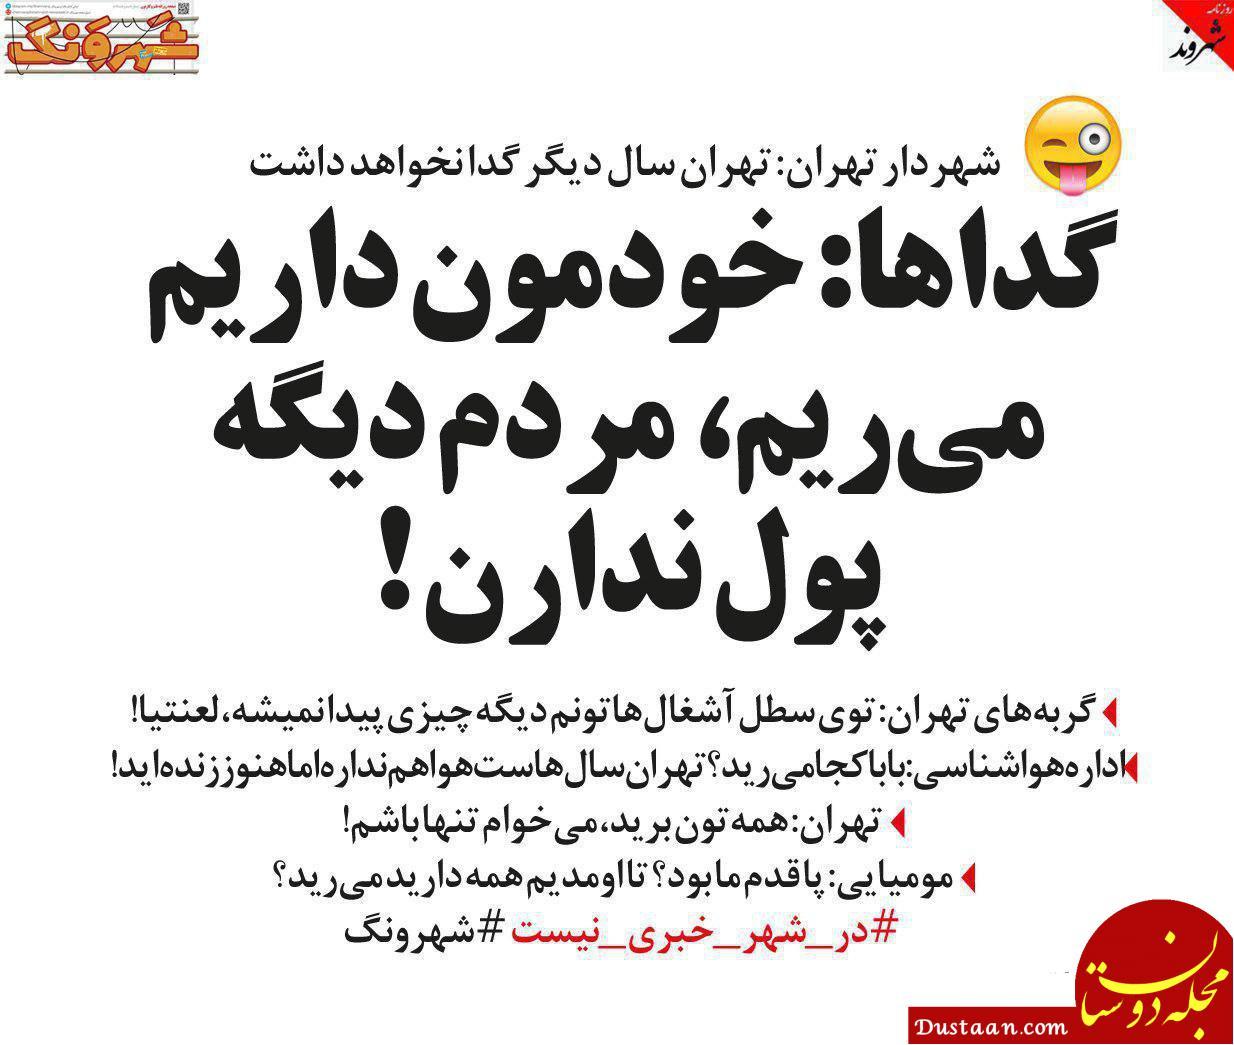 www.dustaan.com واکنش گداها و گربه ها به شهردار تهران؛ خودمون داریم می ریم، مردم پول ندارن!